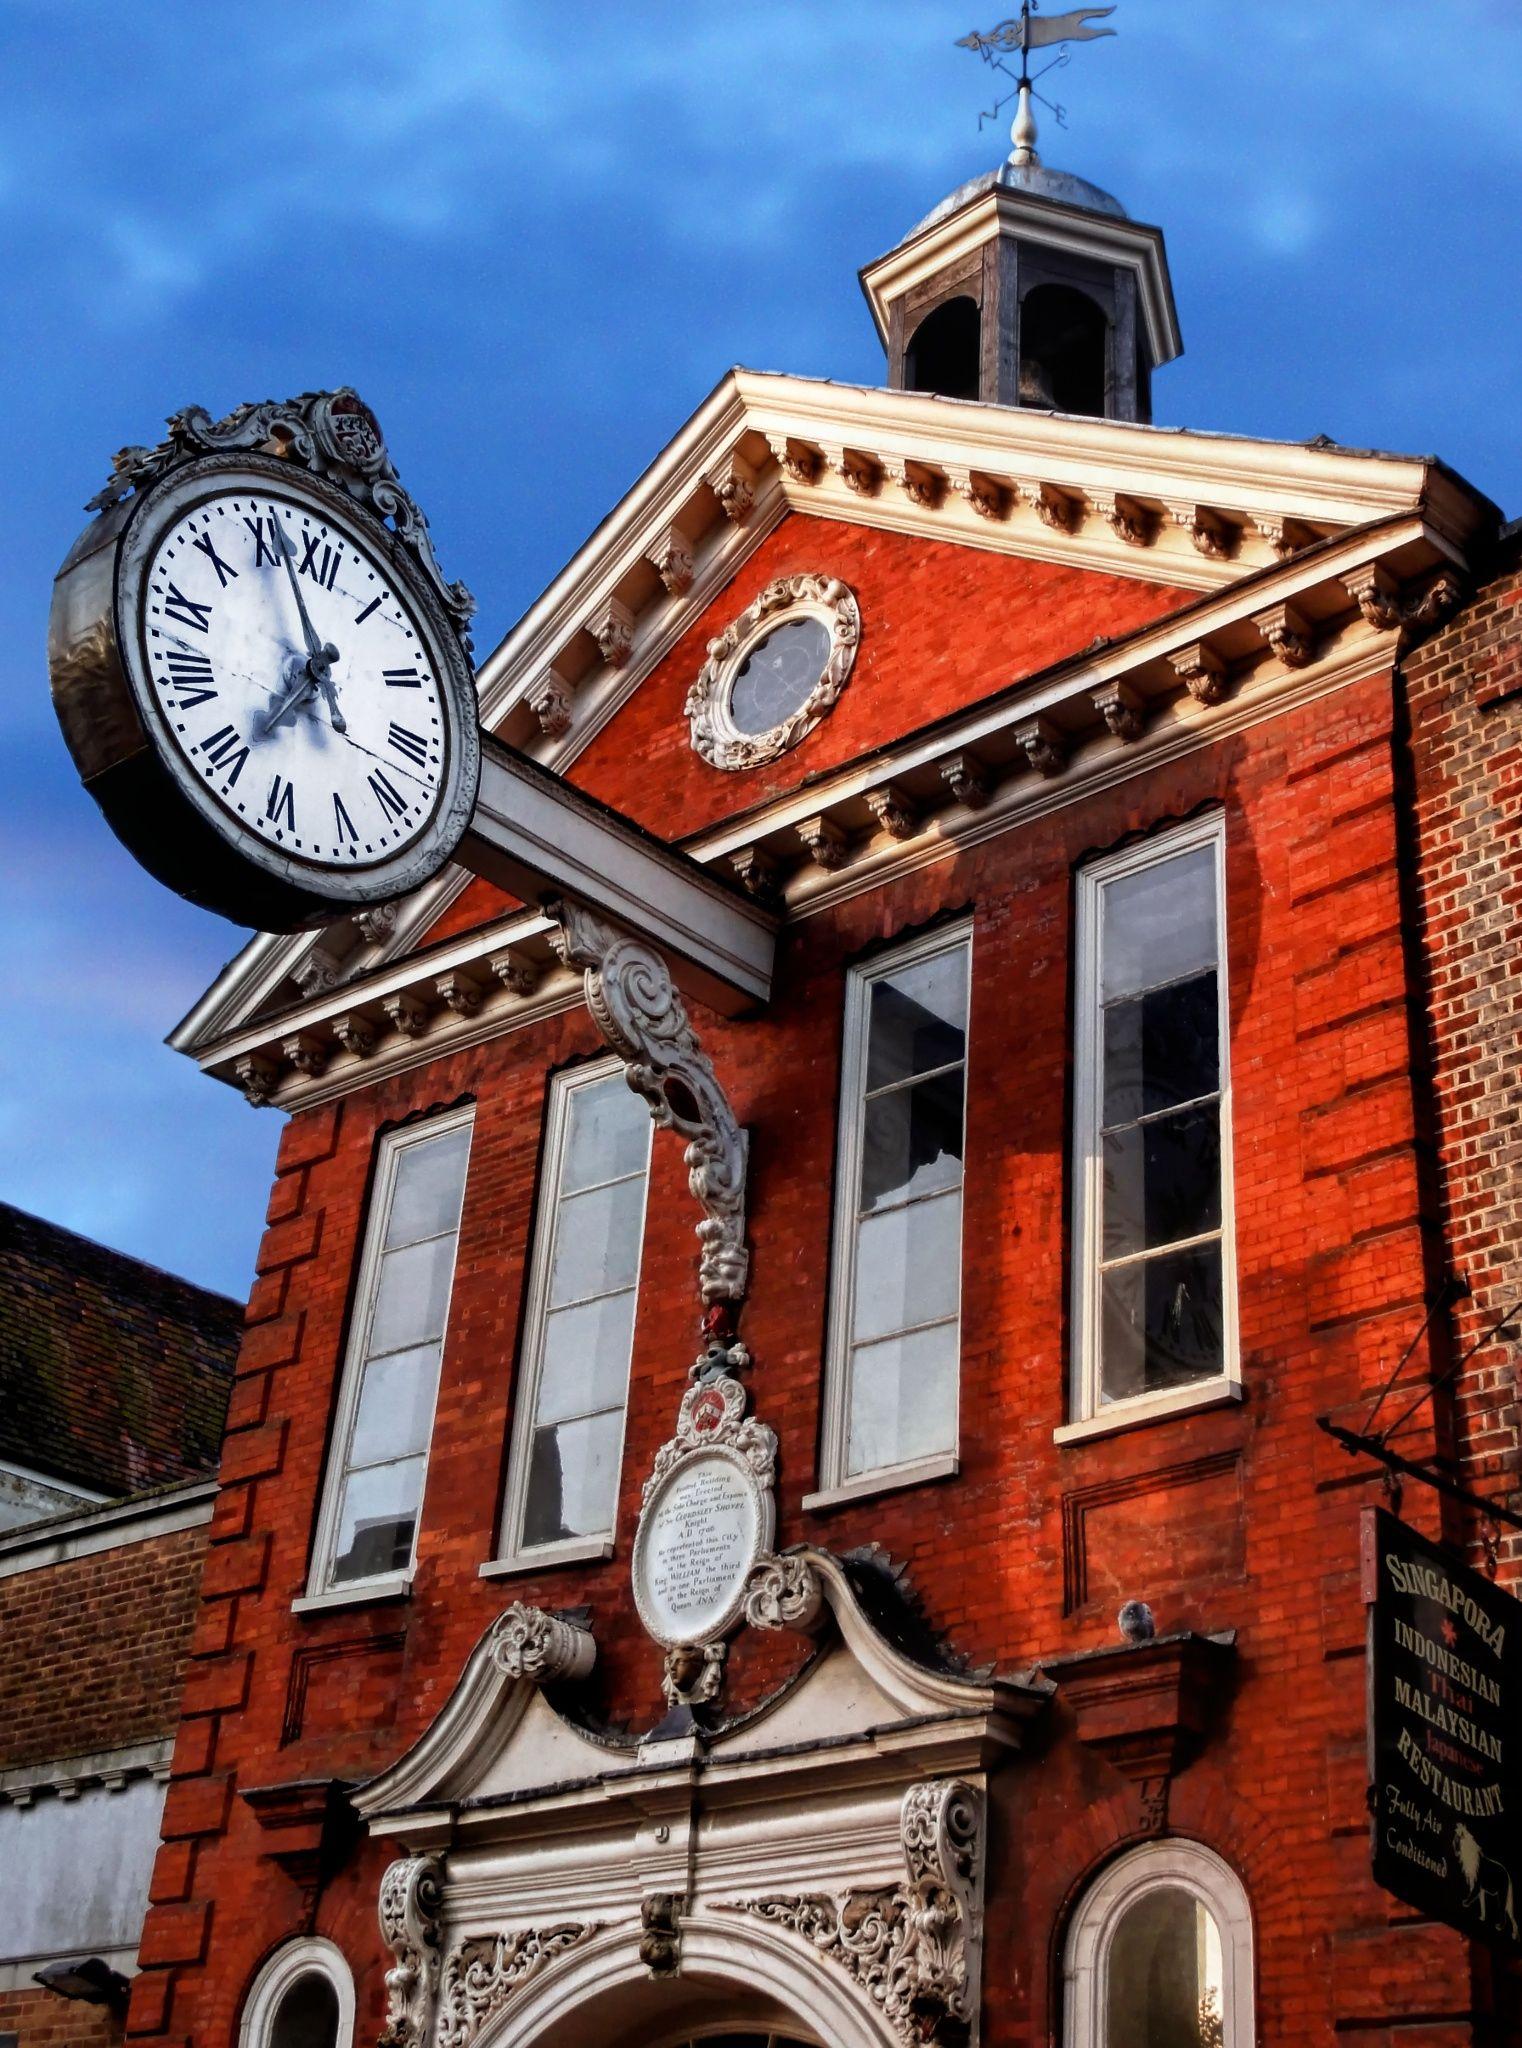 The Old Corn Exchange Rochester Kent England Outdoor Clock Clock Cool Clocks